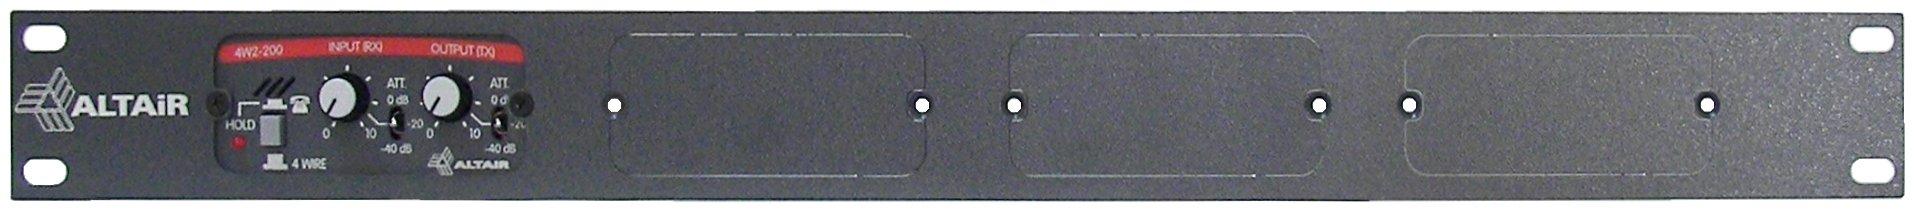 PC-4-200